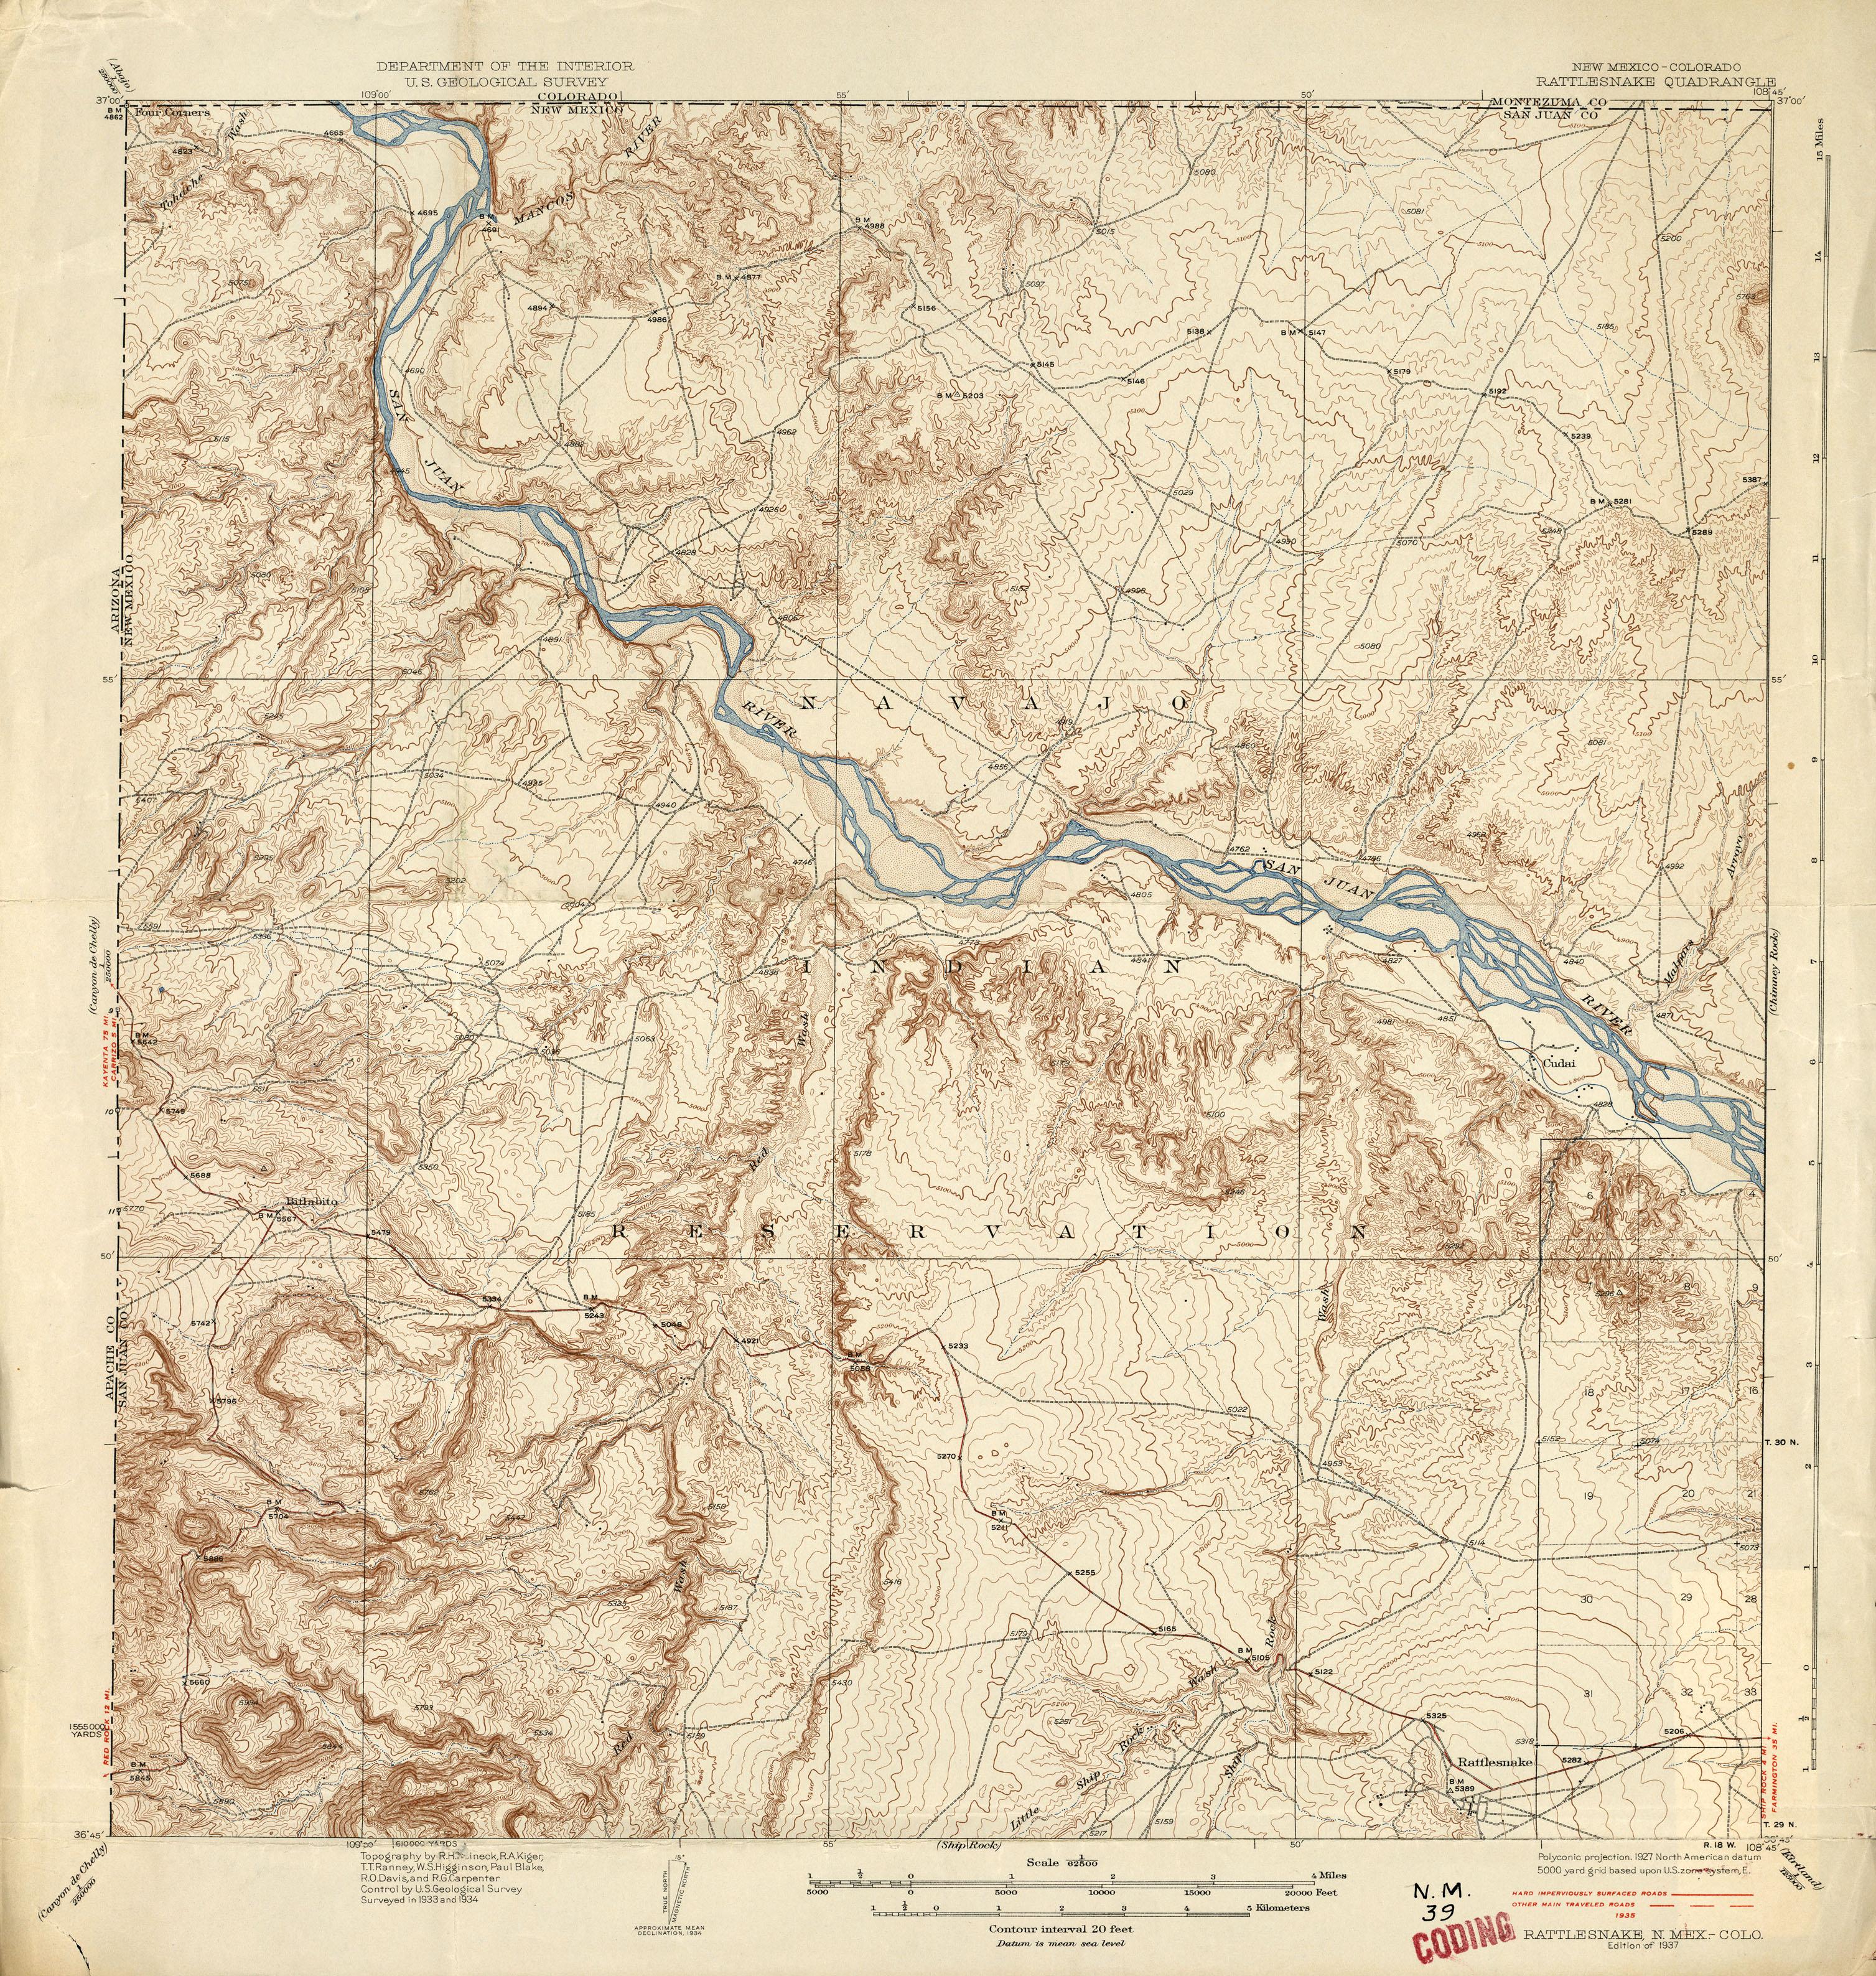 New Mexico Historical Topographic Maps PerryCastañeda Map - Colorado topo maps